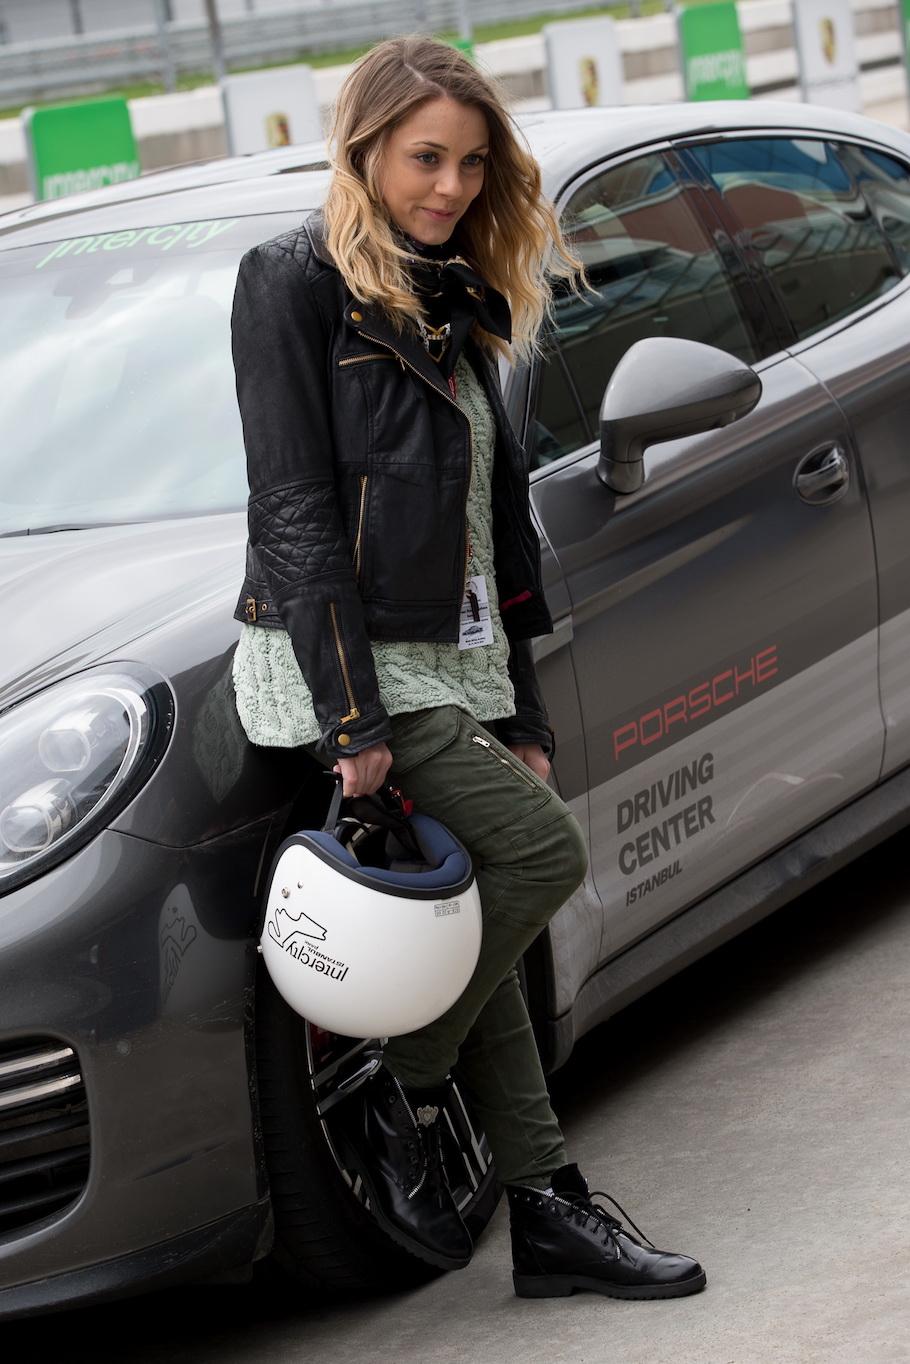 Porsche Media Driving Academy 02